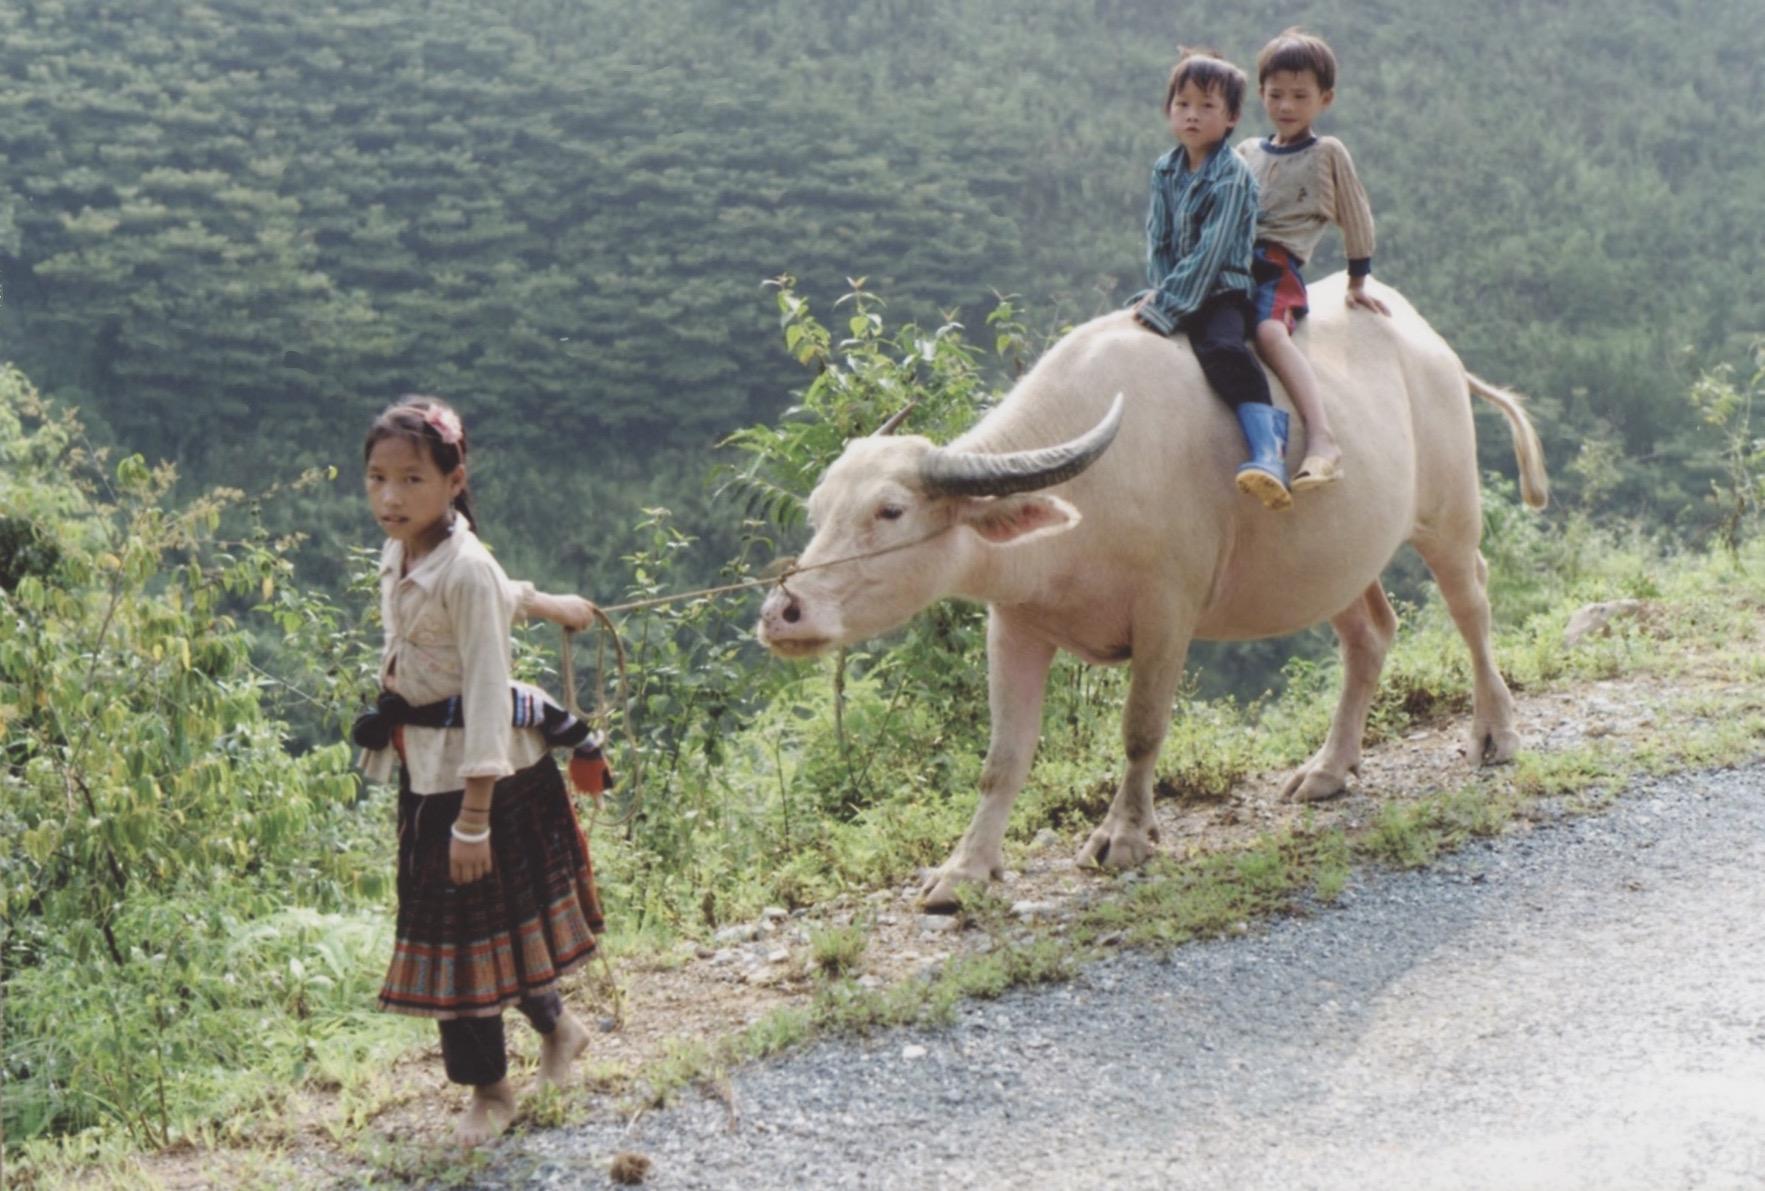 Co Tu Tribe in Kon Tum Province 9.jpeg